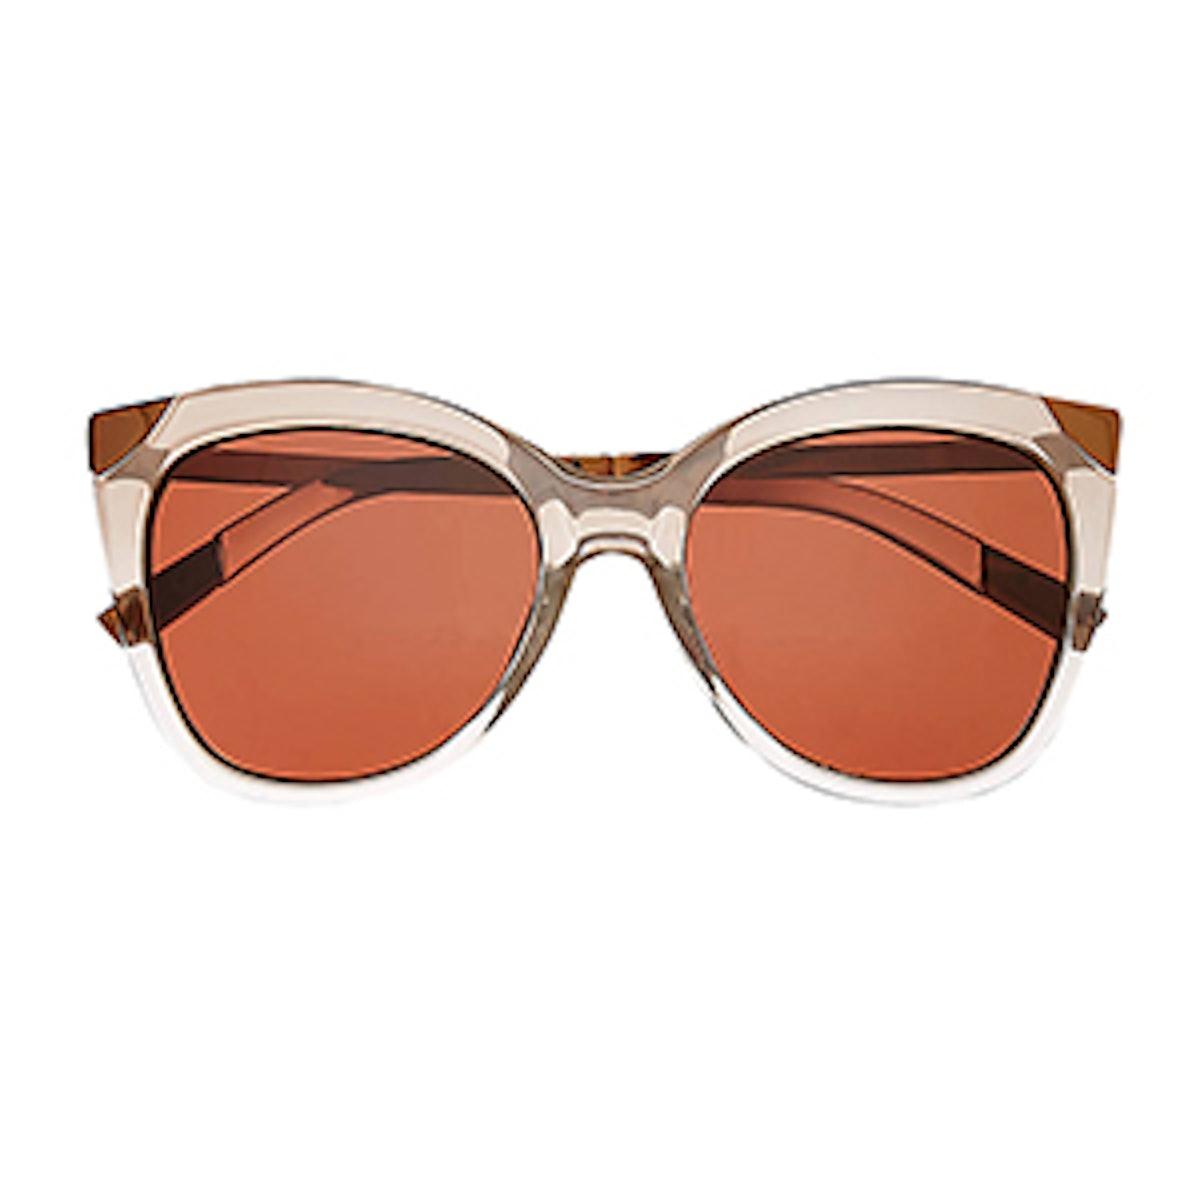 Rose Gold Cat Eye Sunglasses